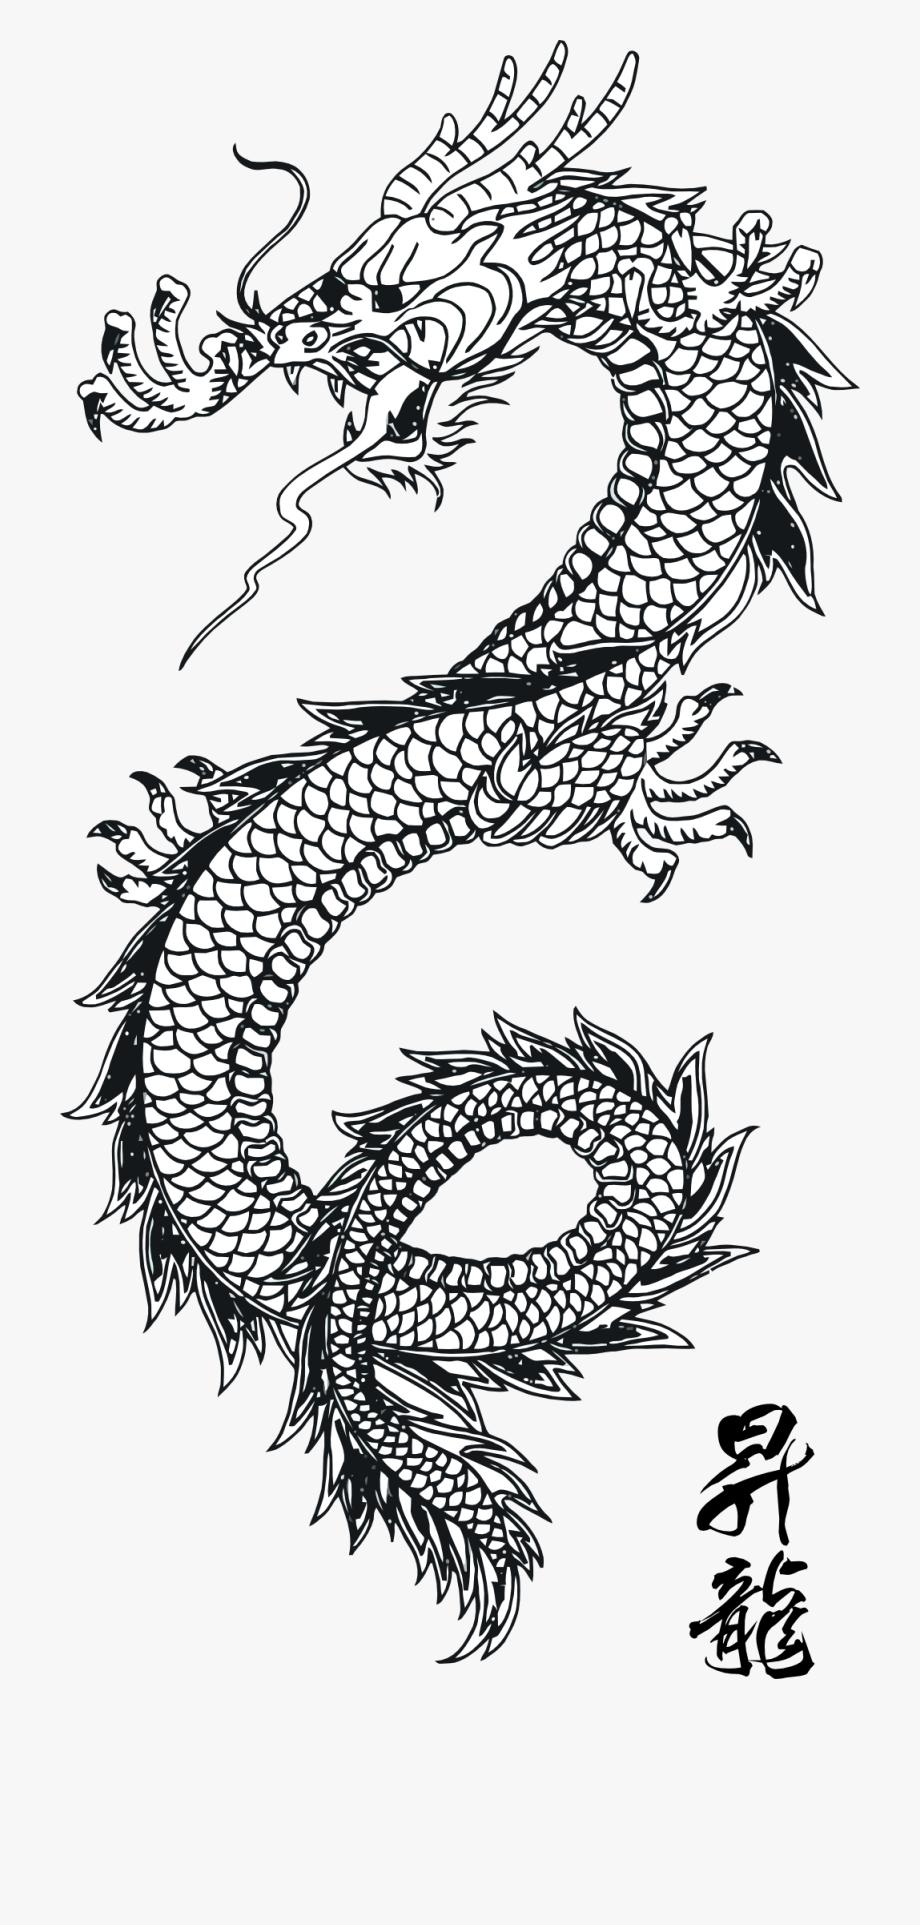 Chinese Dragon Tattoo Png Dragon Tattoo Arm Chinese Dragon Tattoos Asian Dragon Tattoo